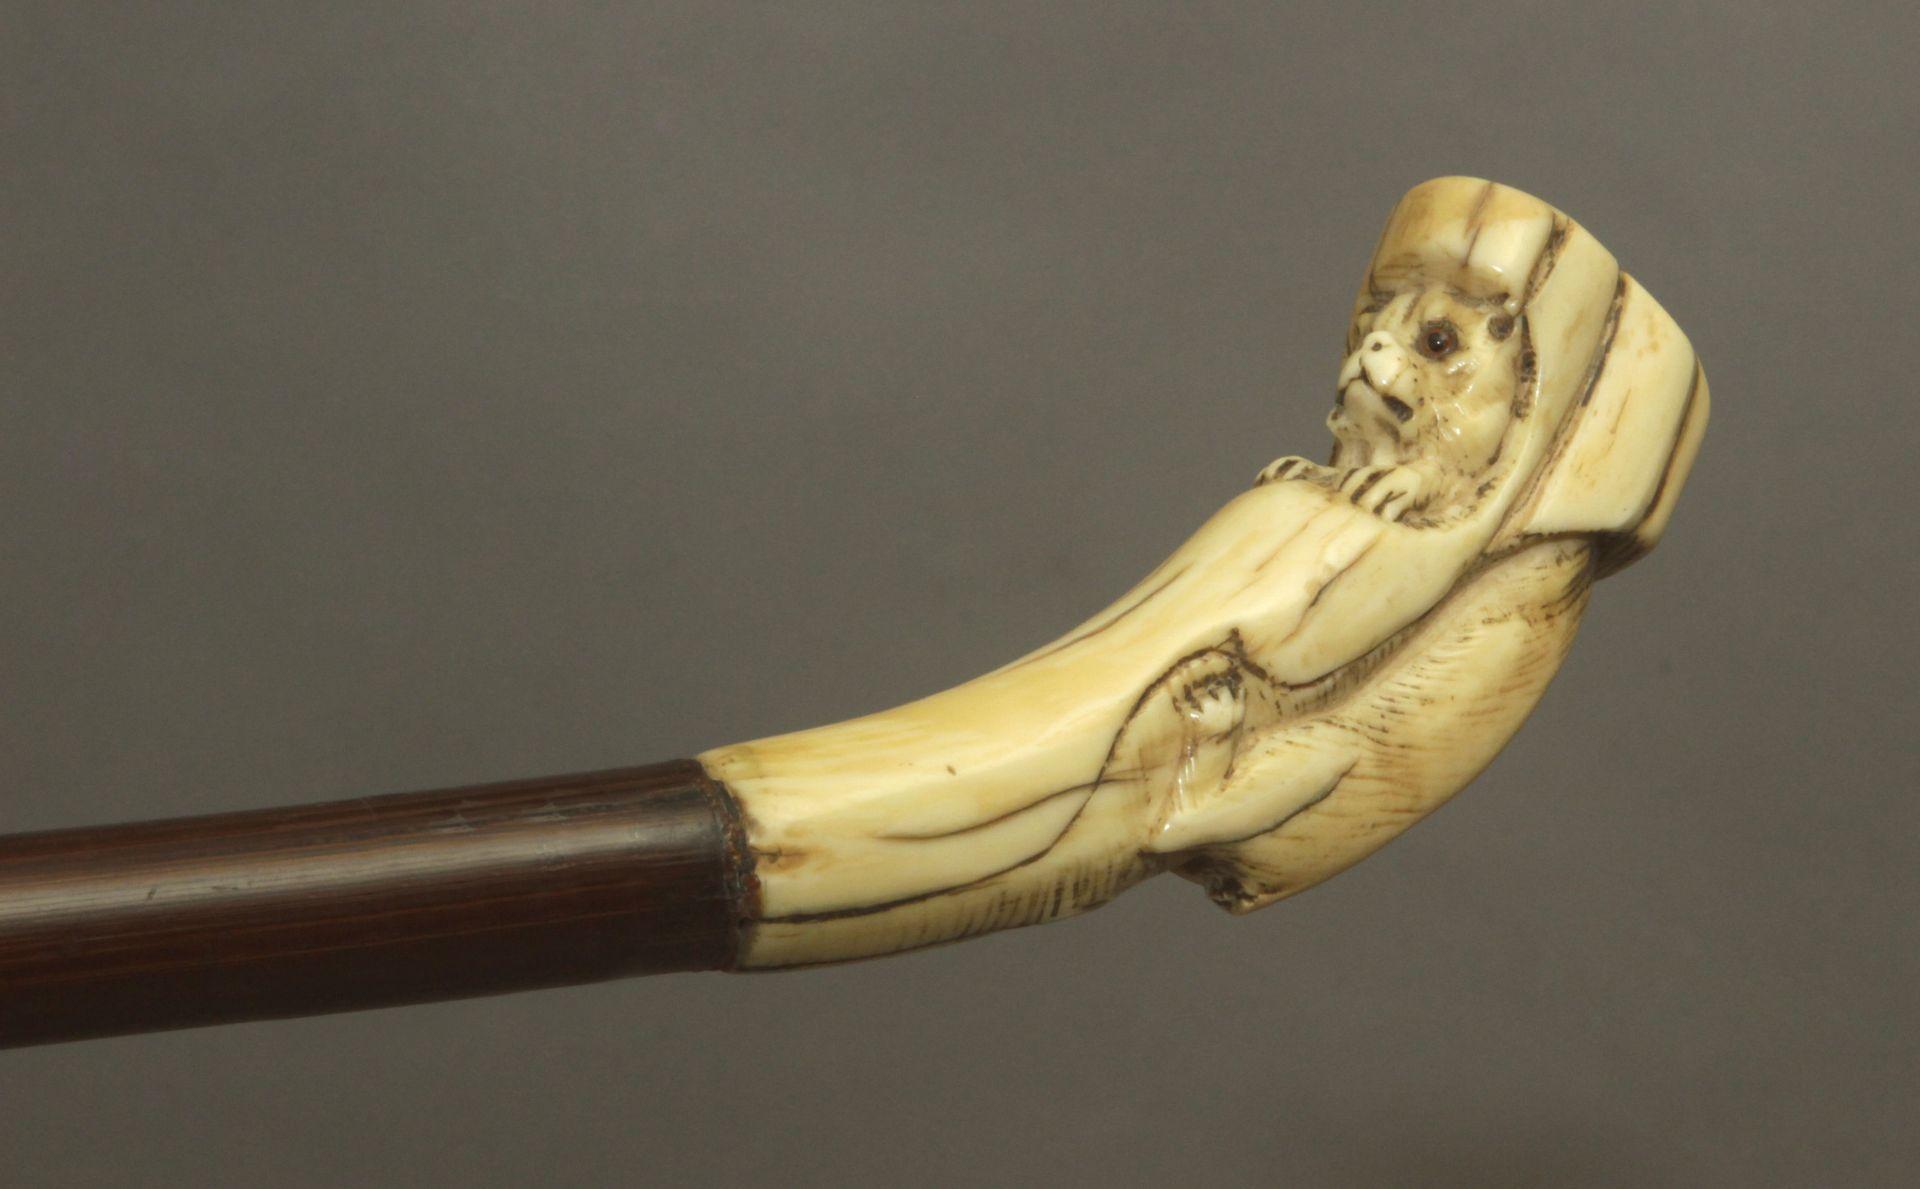 A 19th century ivory handled walking stick